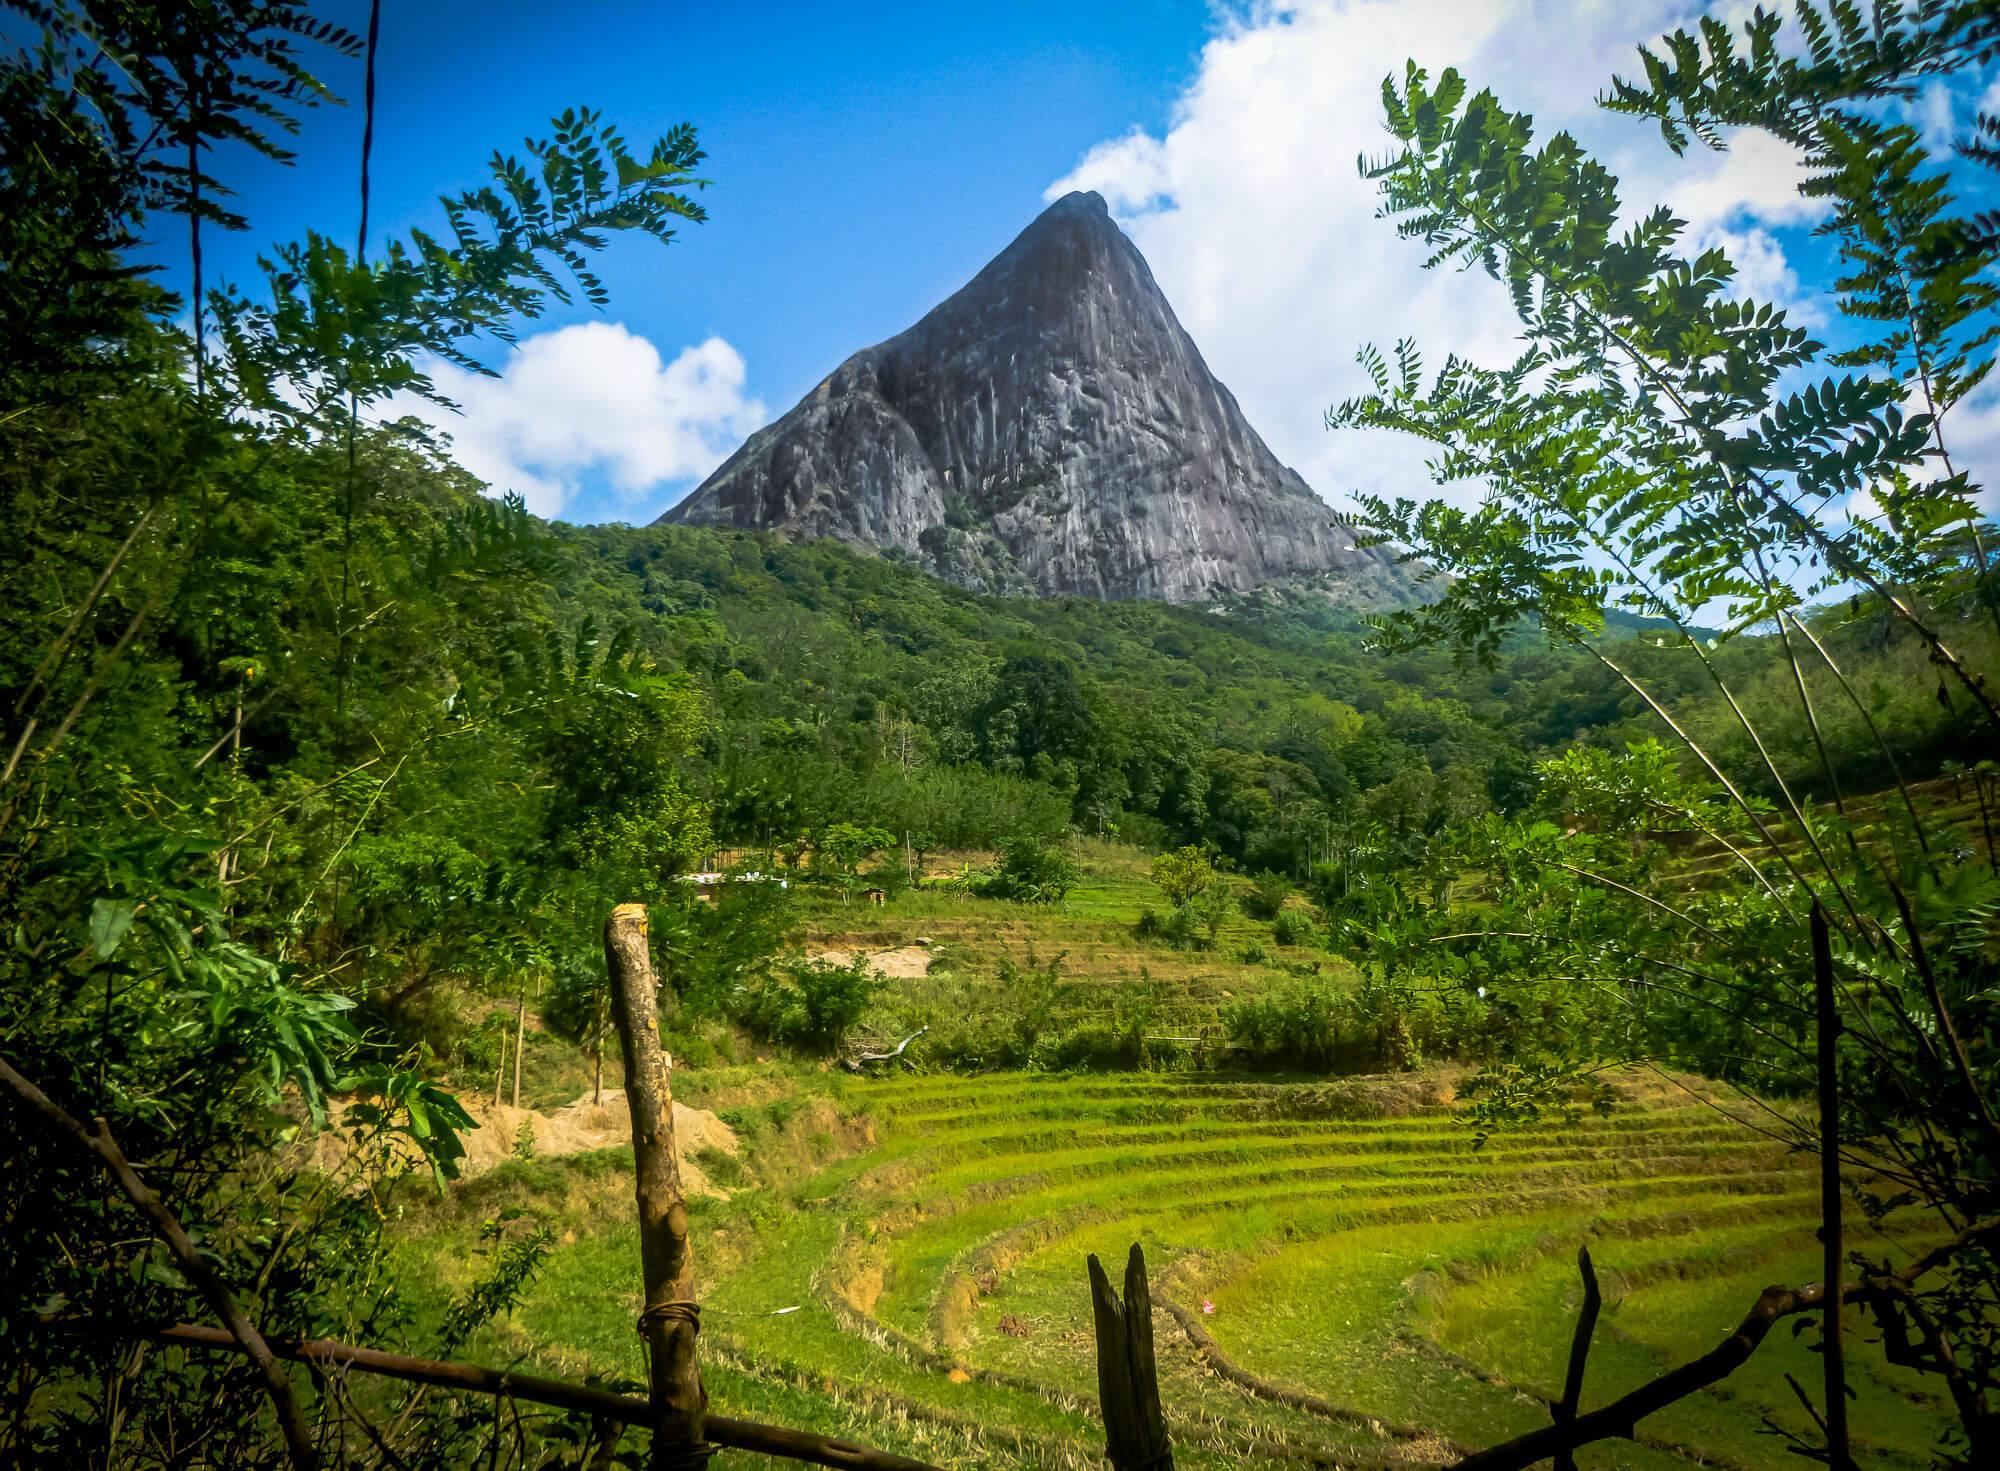 Lakegala mountain from Meemure Village - off the beaten path Sri Lanka itinerary